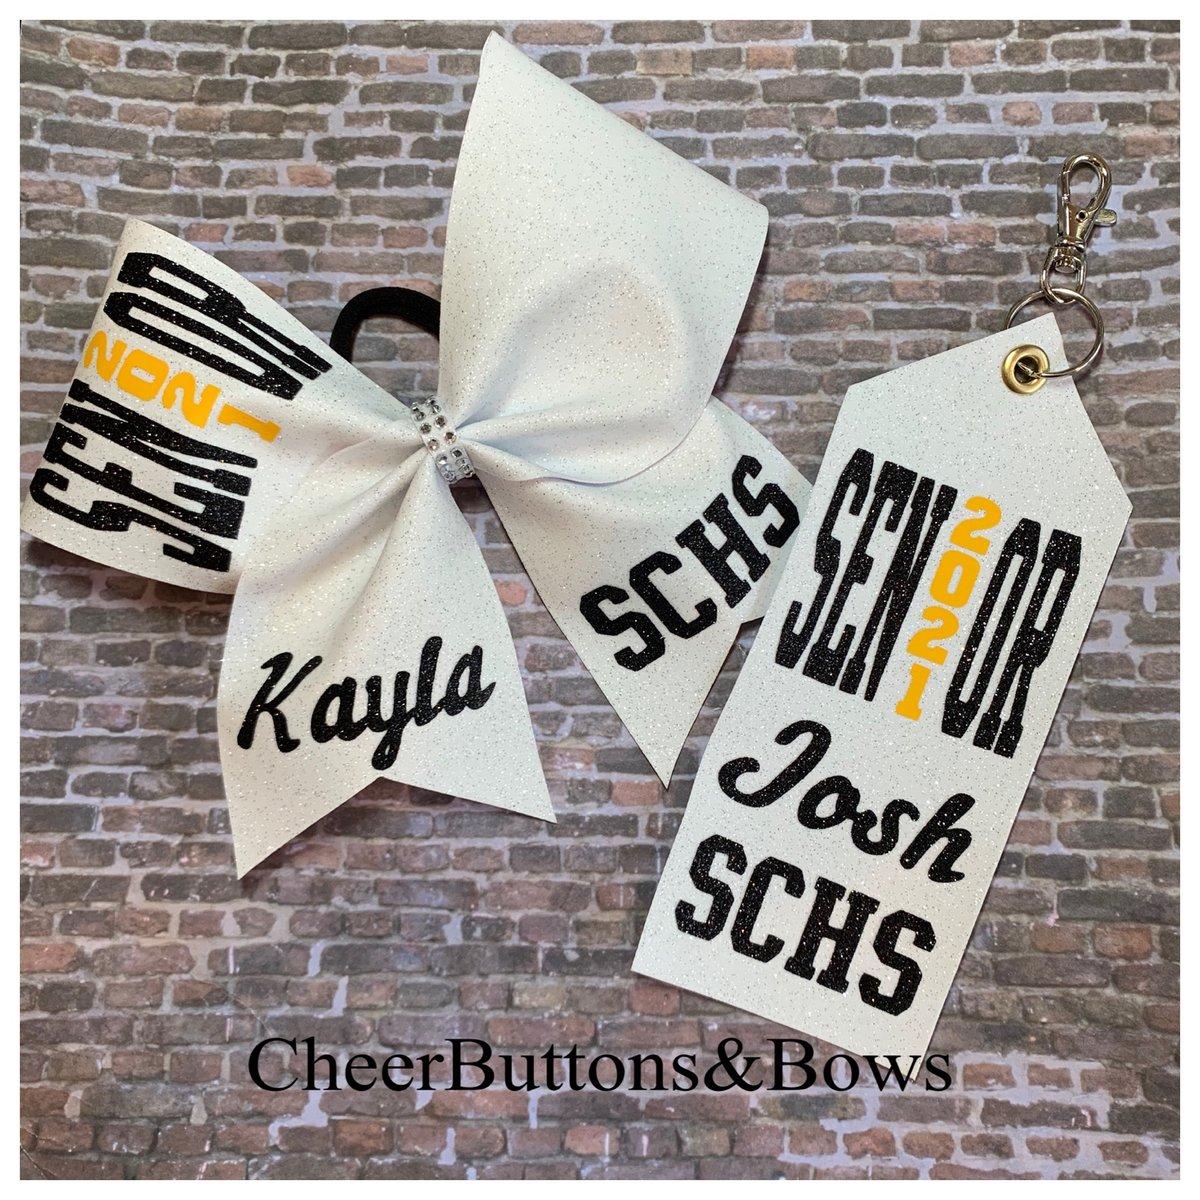 Smith-Cotton High School, Missouri  Senior 2021 cheer bows. Best wishes to Kayla and Josh! https://soo.nr/phnN #cheerbow #cheerleading #cheerleader #cheerislife #cheer #cheerleader #cheercoach #cheerleaders #cheerbows #hairbows #cheerbuttonsandbowspic.twitter.com/nkovBovjyb